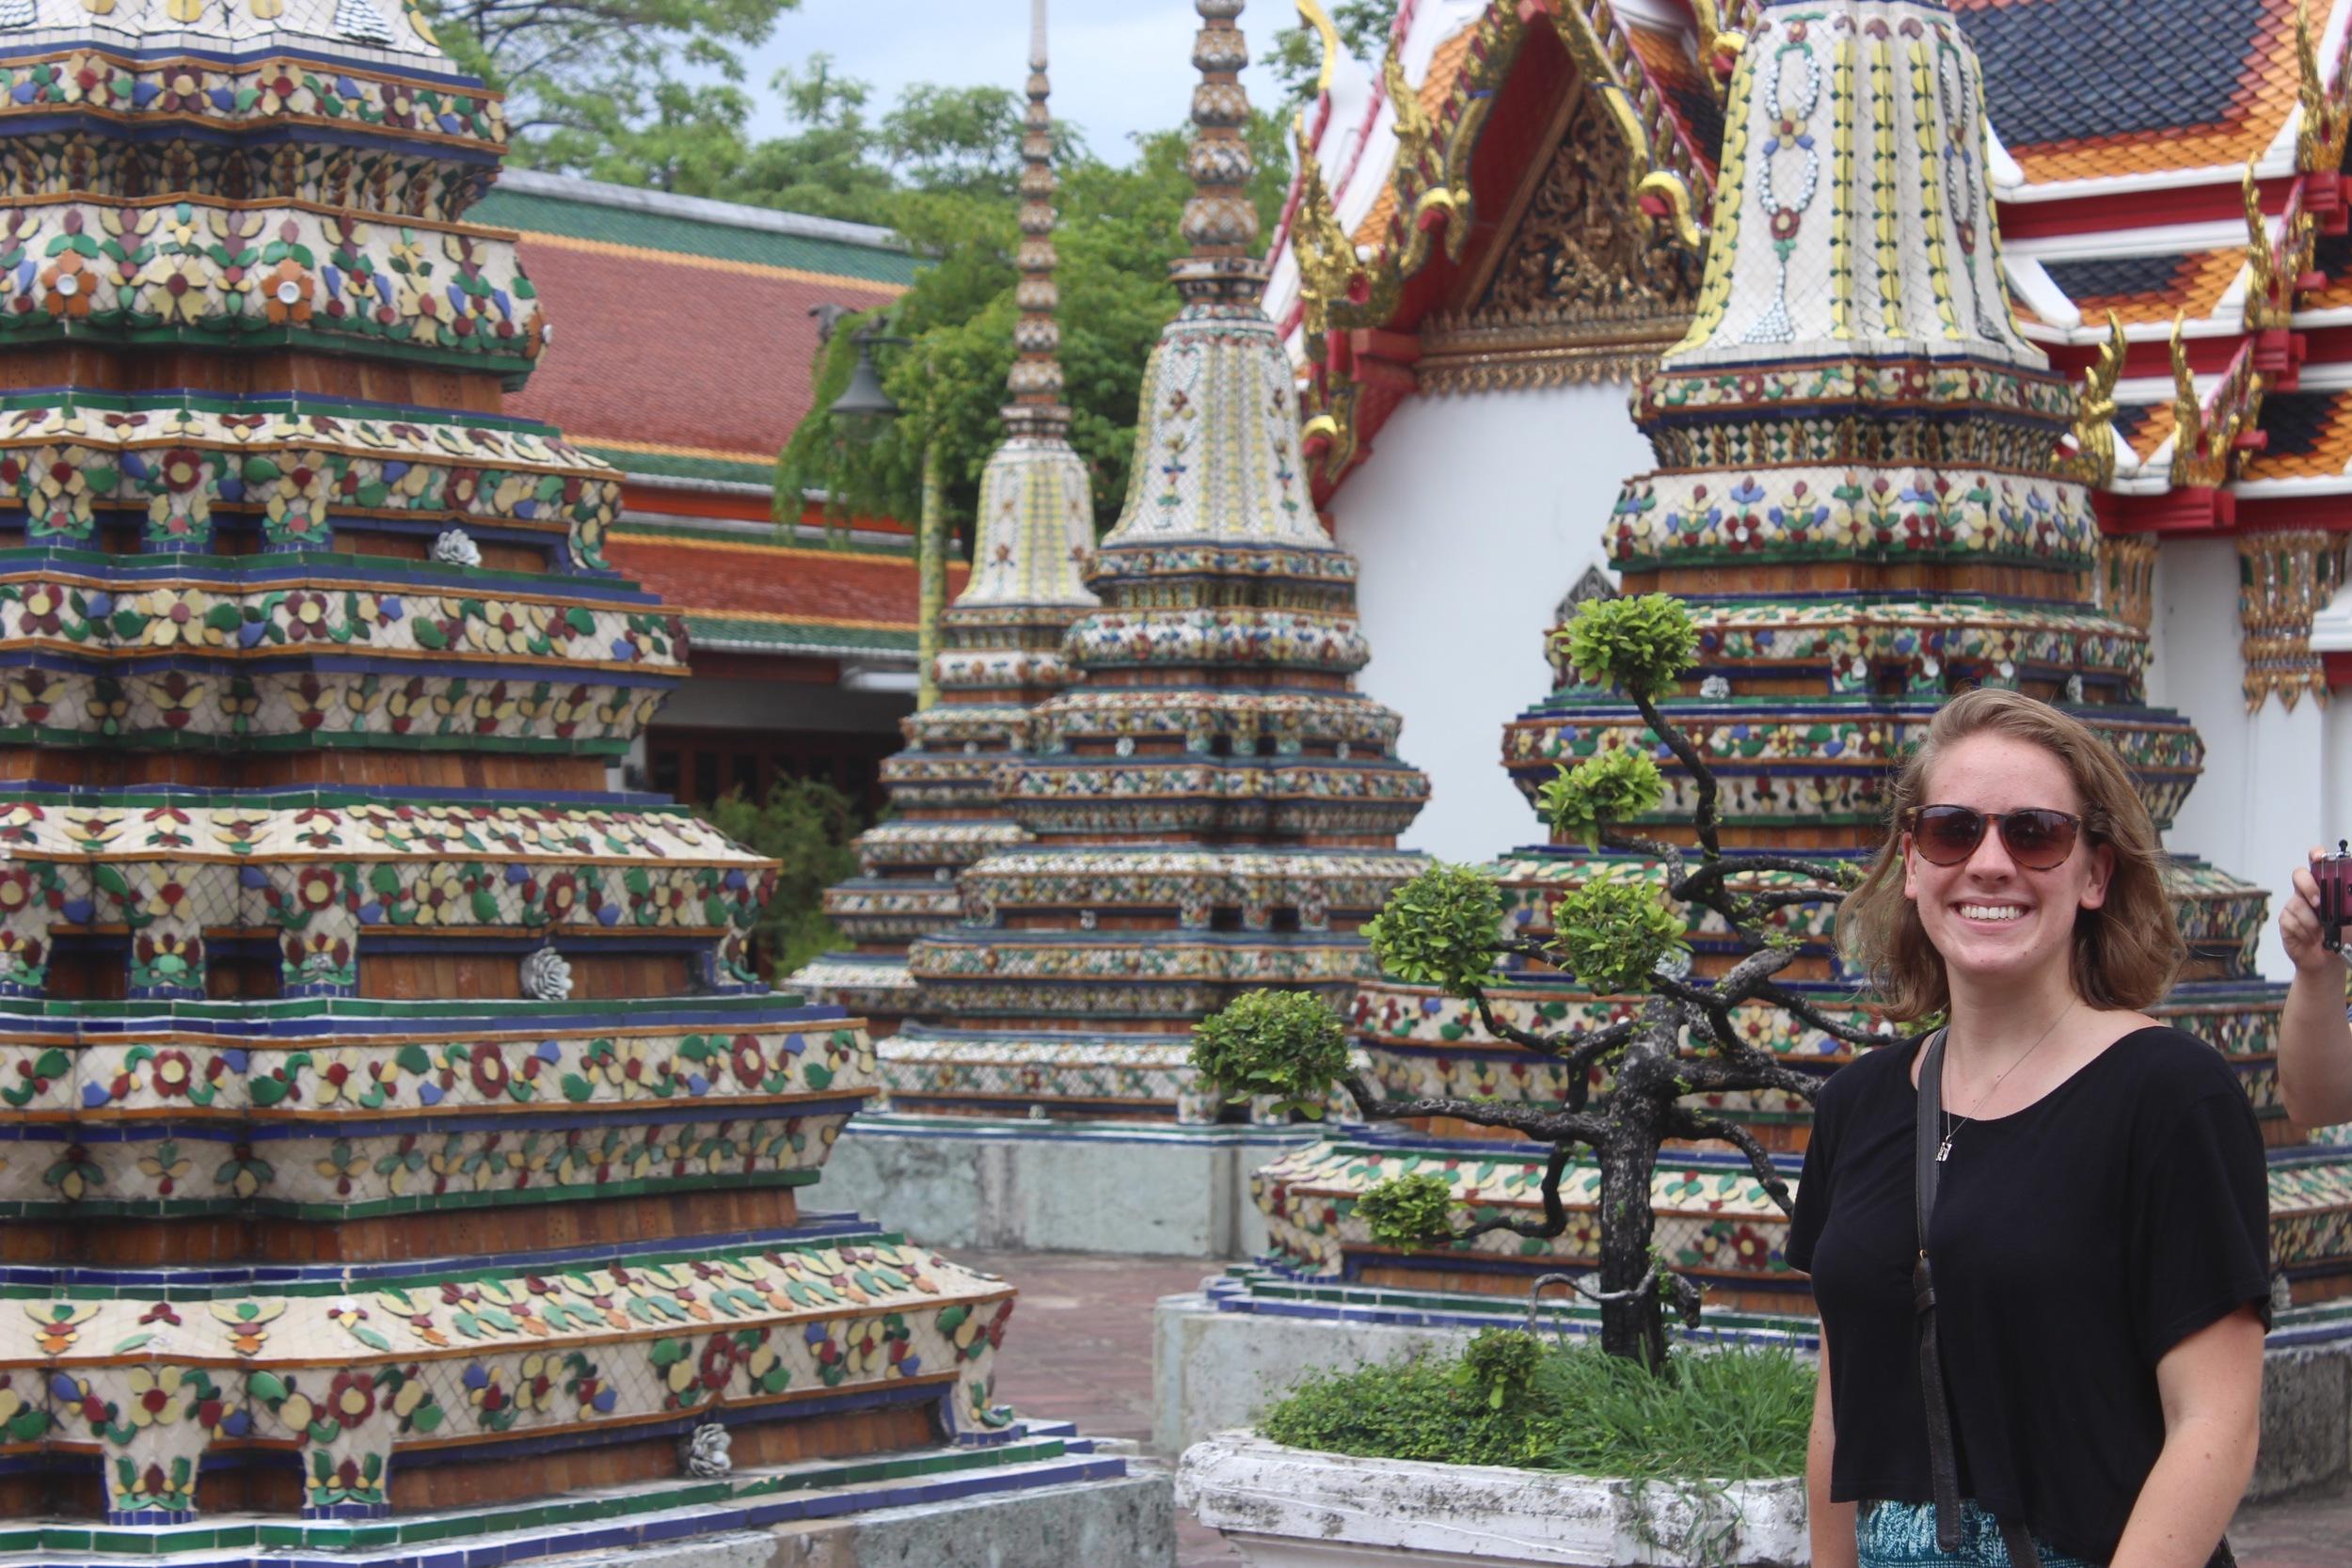 Wat pho temple in bangkok, Thailand                                                                                                                                                            photo by: Patrick springer